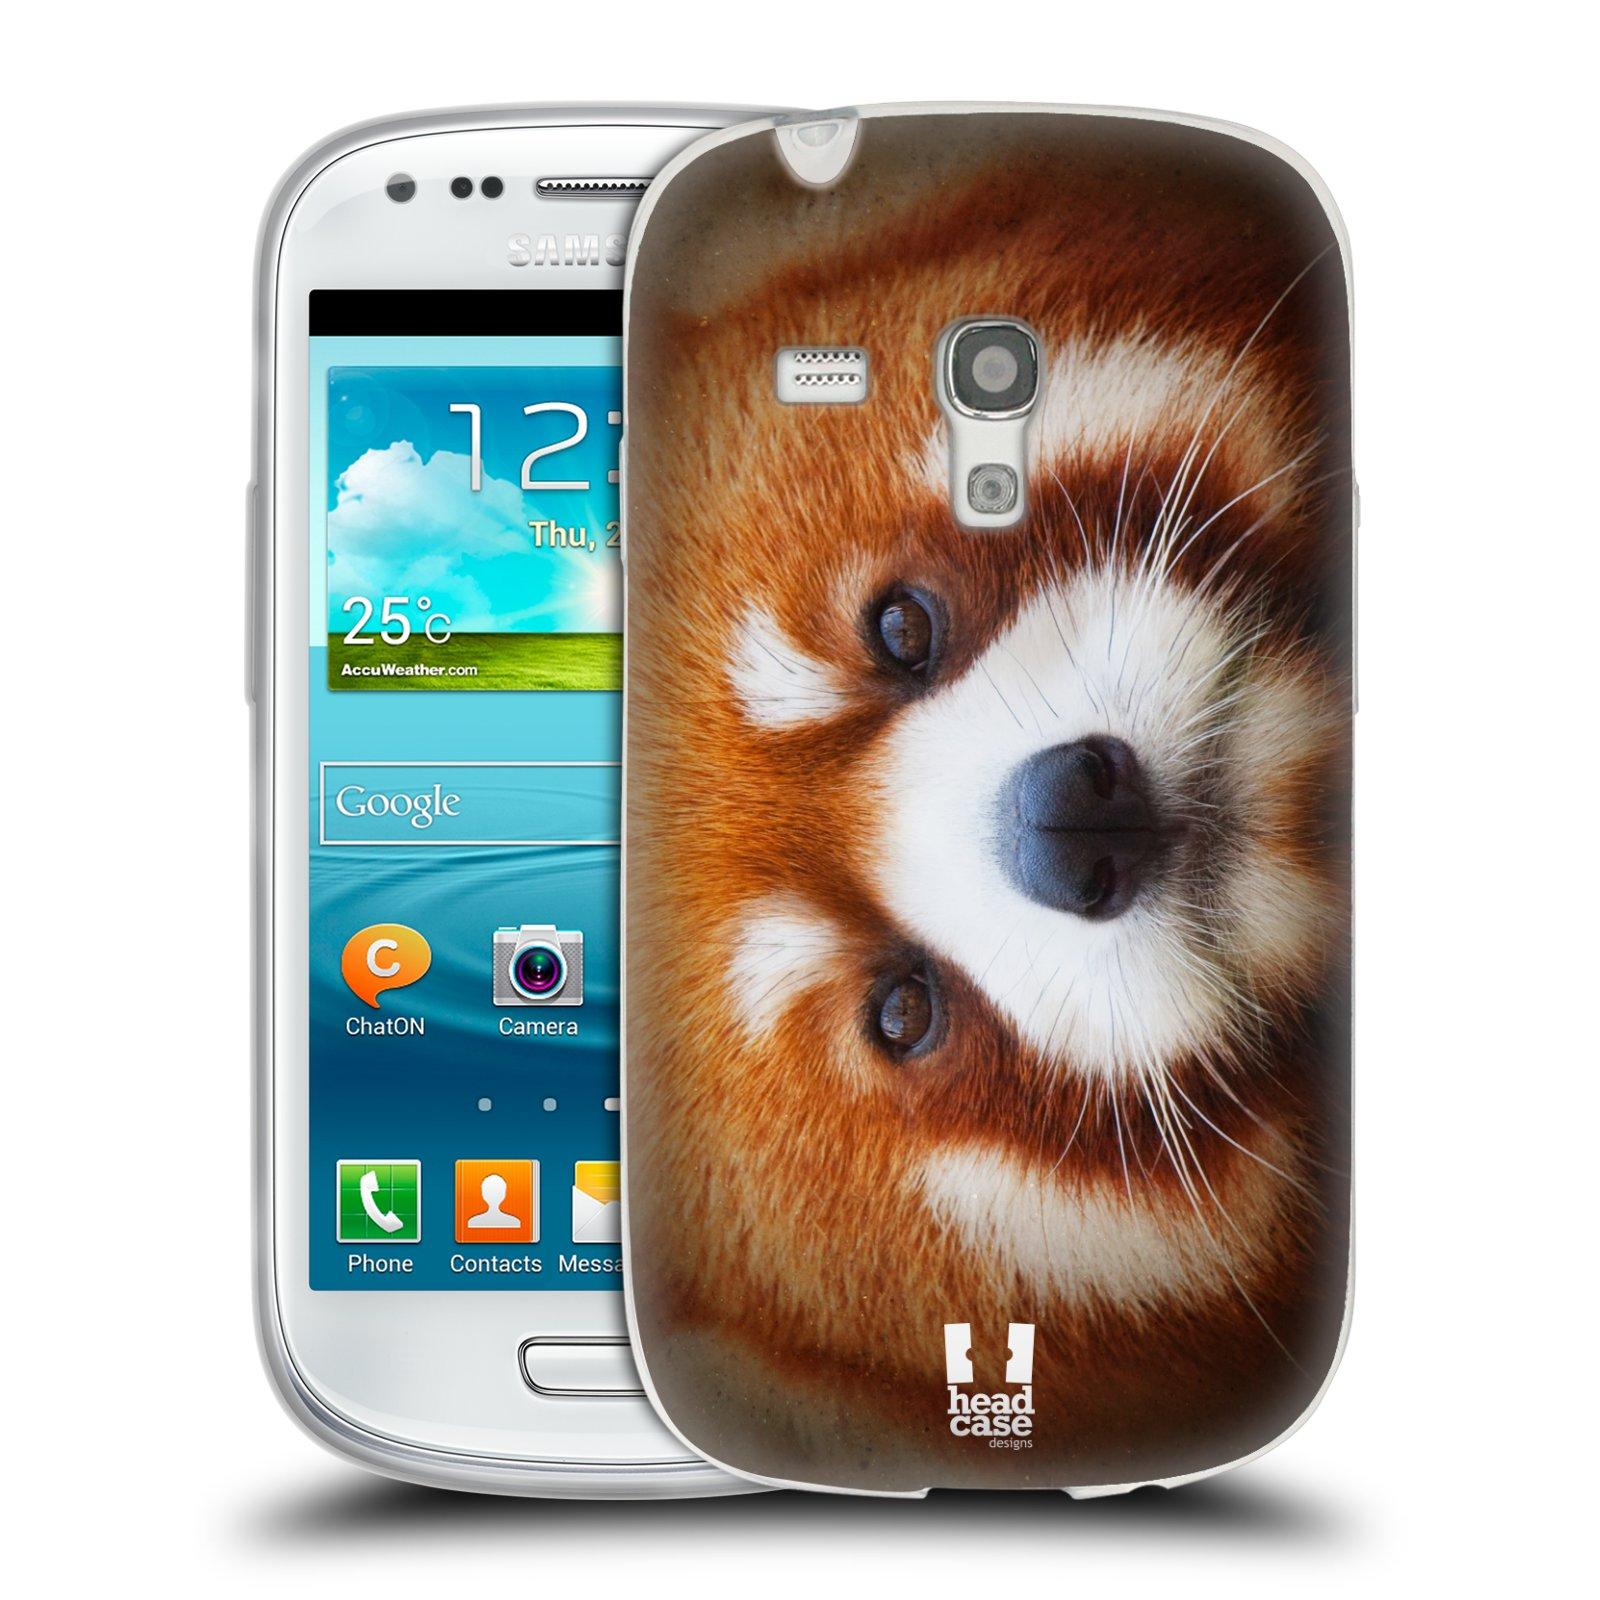 HEAD CASE silikonový obal na mobil Samsung Galaxy S3 MINI i8190 vzor Zvířecí tváře 2 medvěd panda rudá